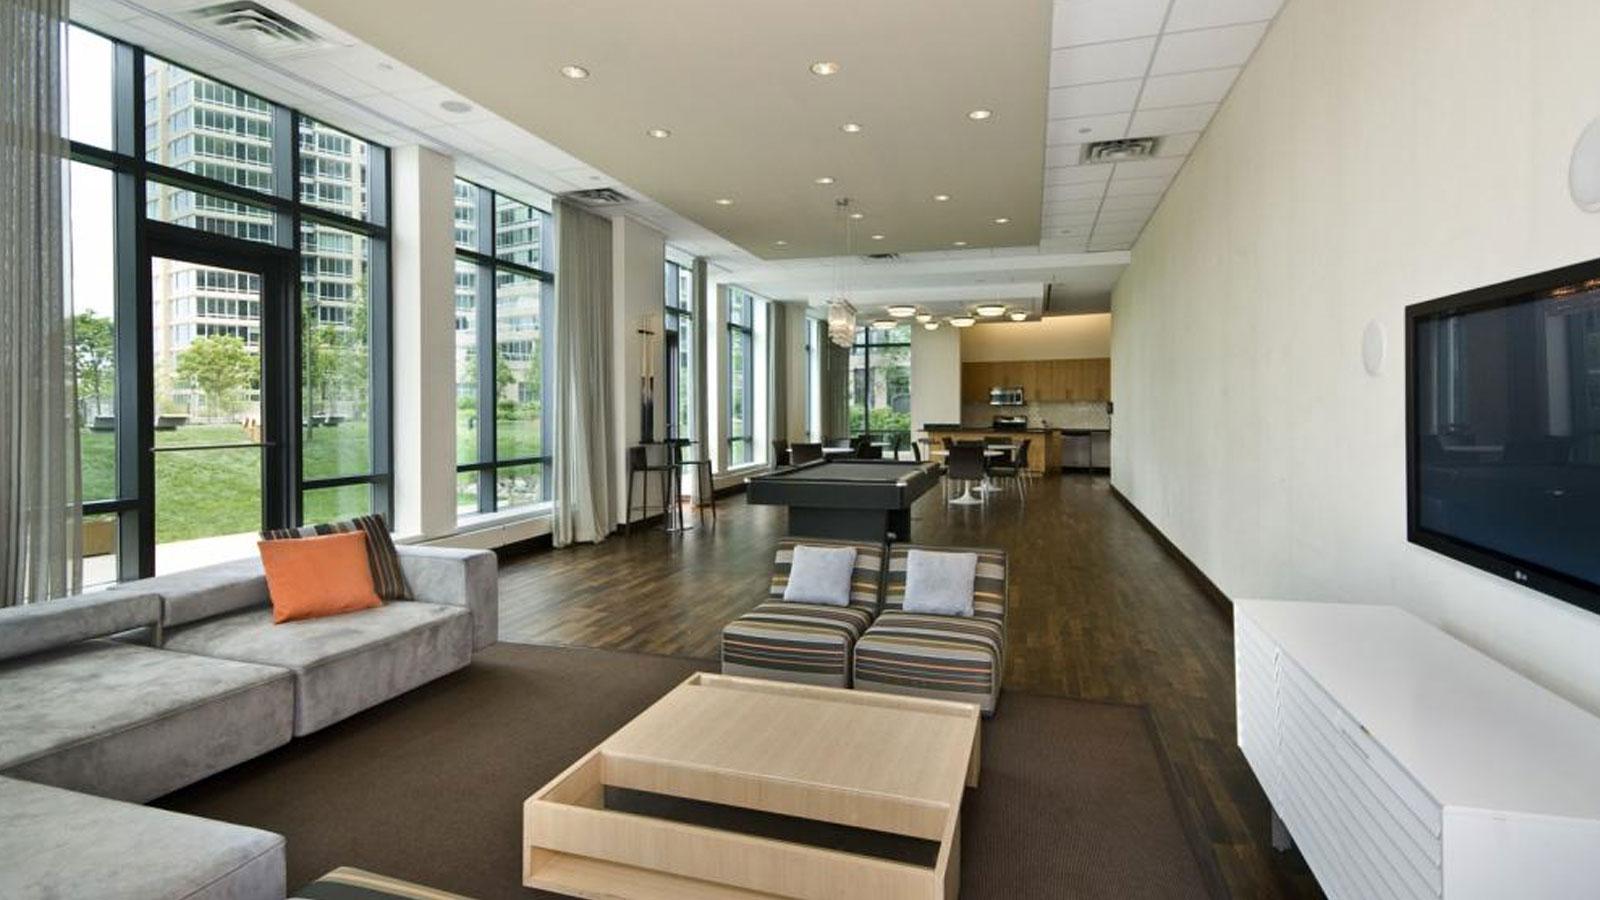 4720 Center Boulevard, NYC - Rental Apartments | CityRealty